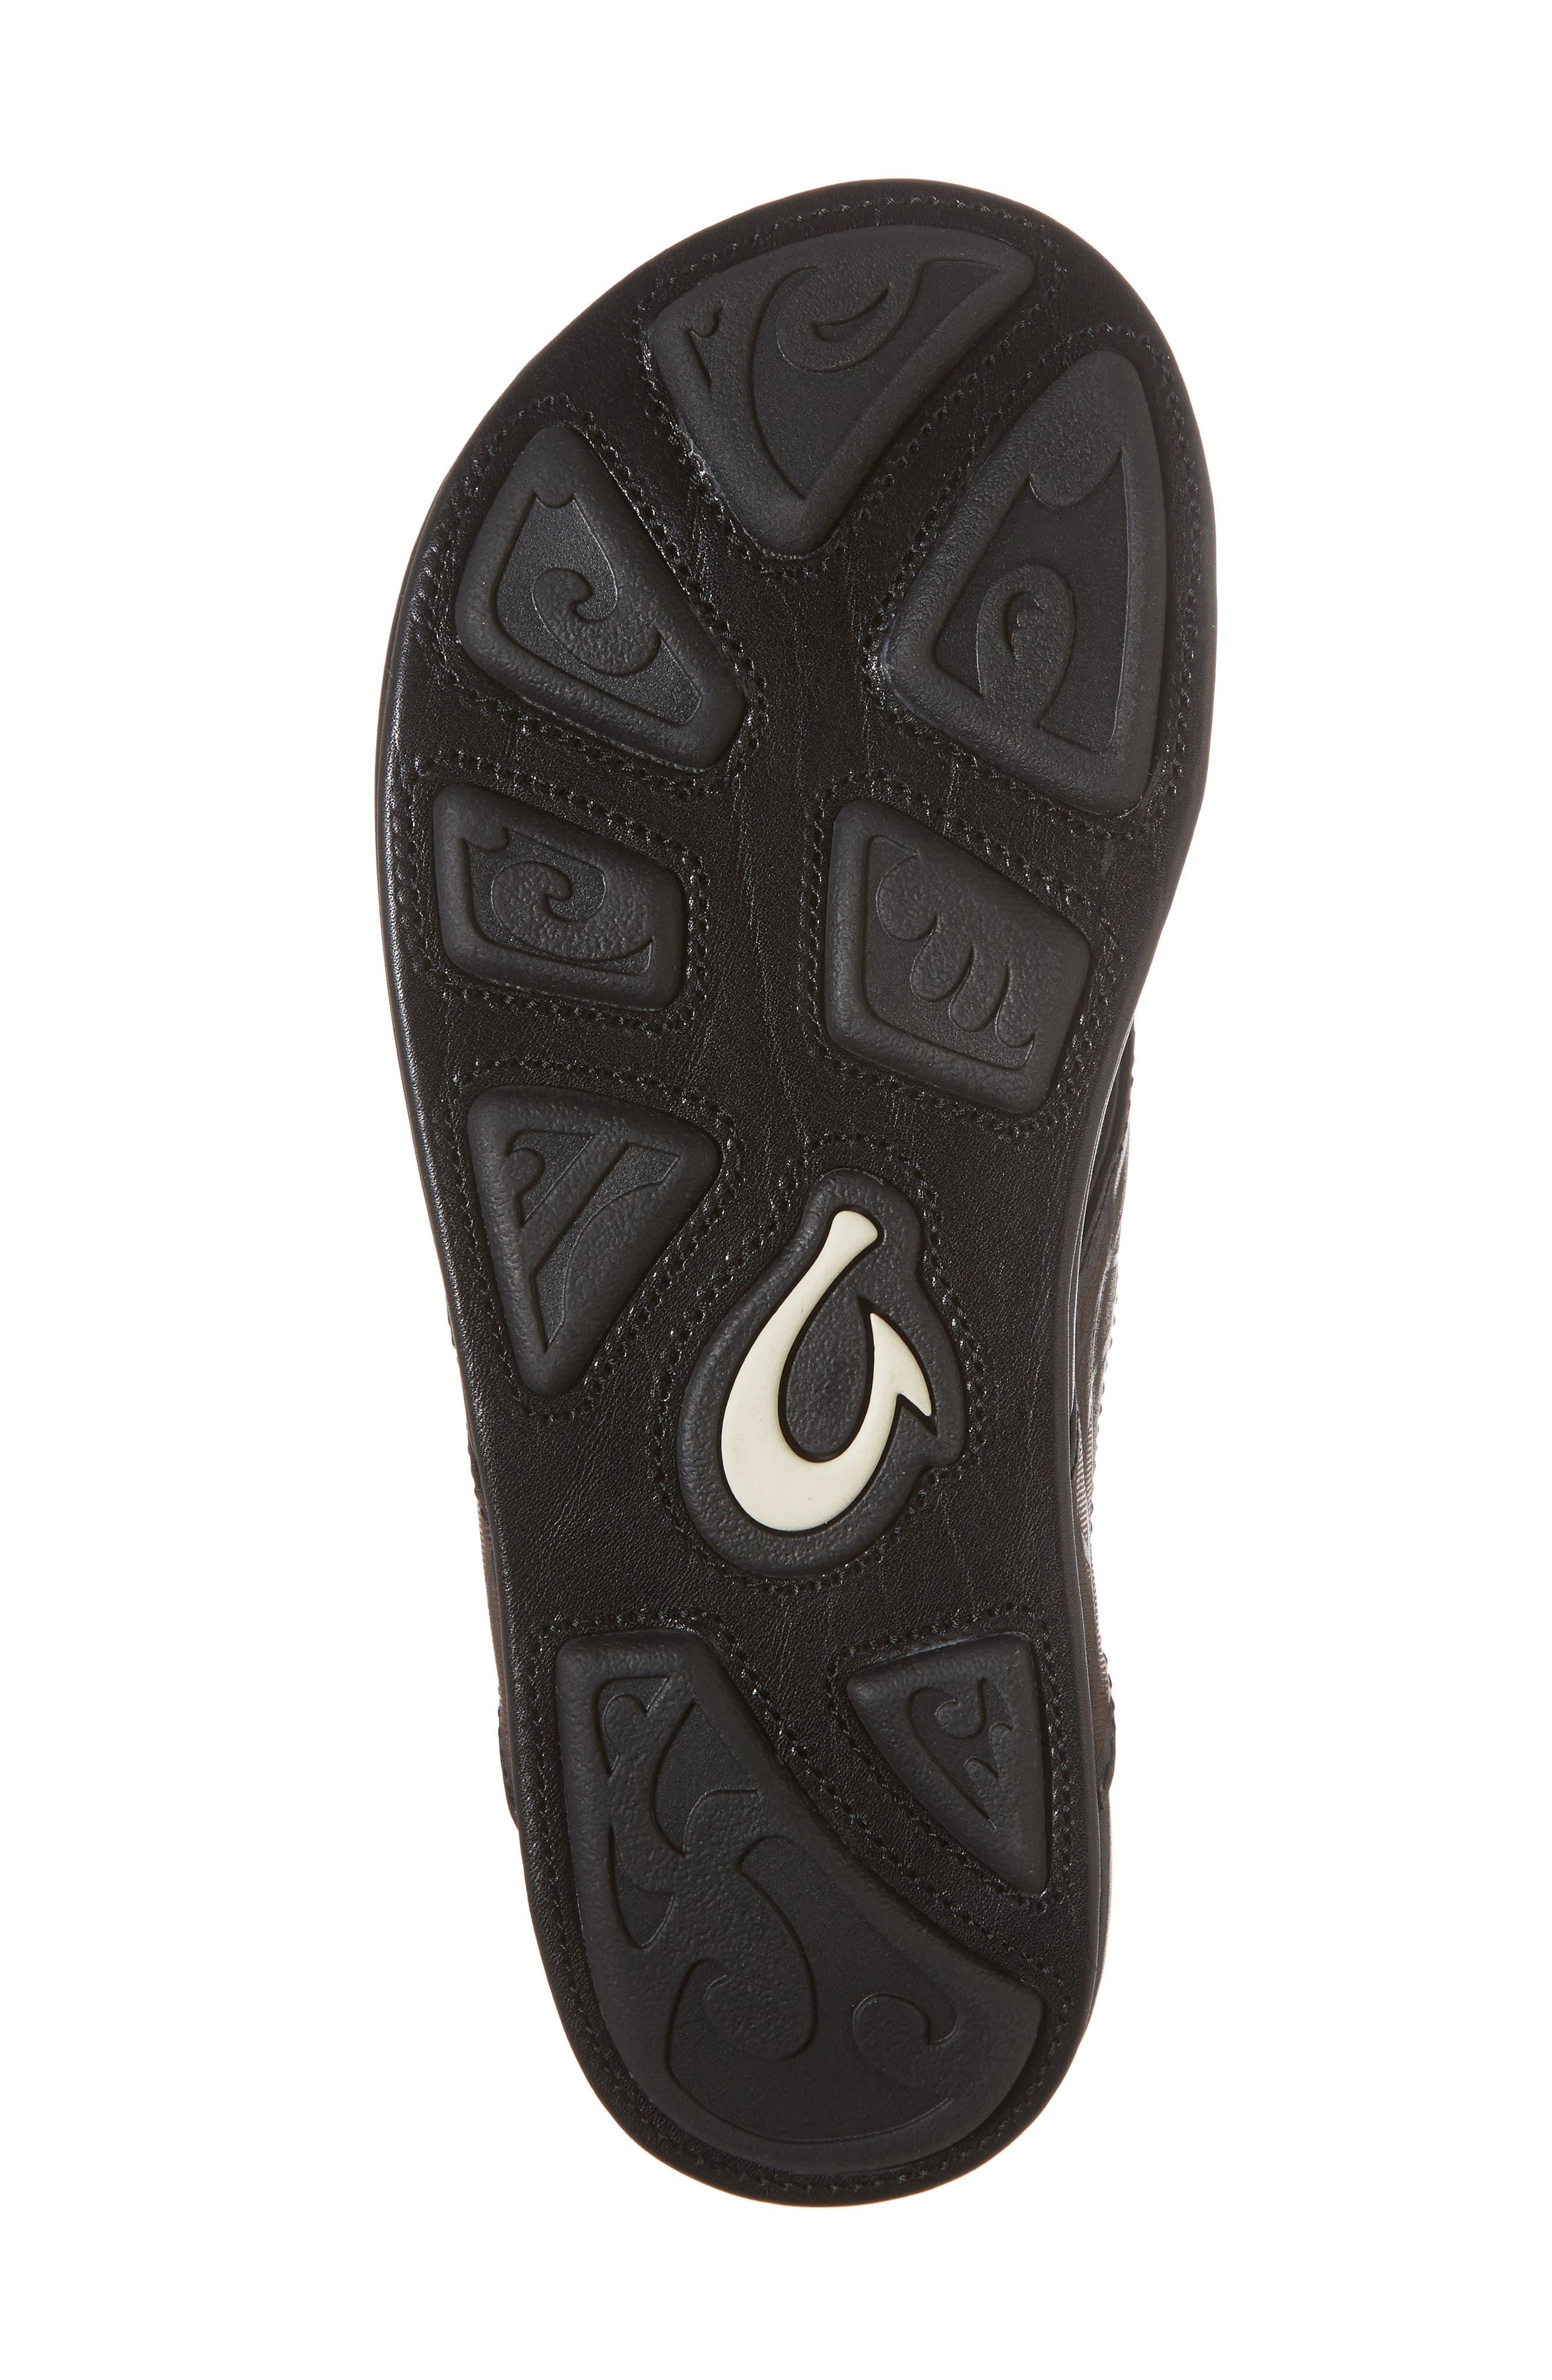 Kulia Flip Flop,                             Alternate thumbnail 6, color,                             Black/ Black Leather